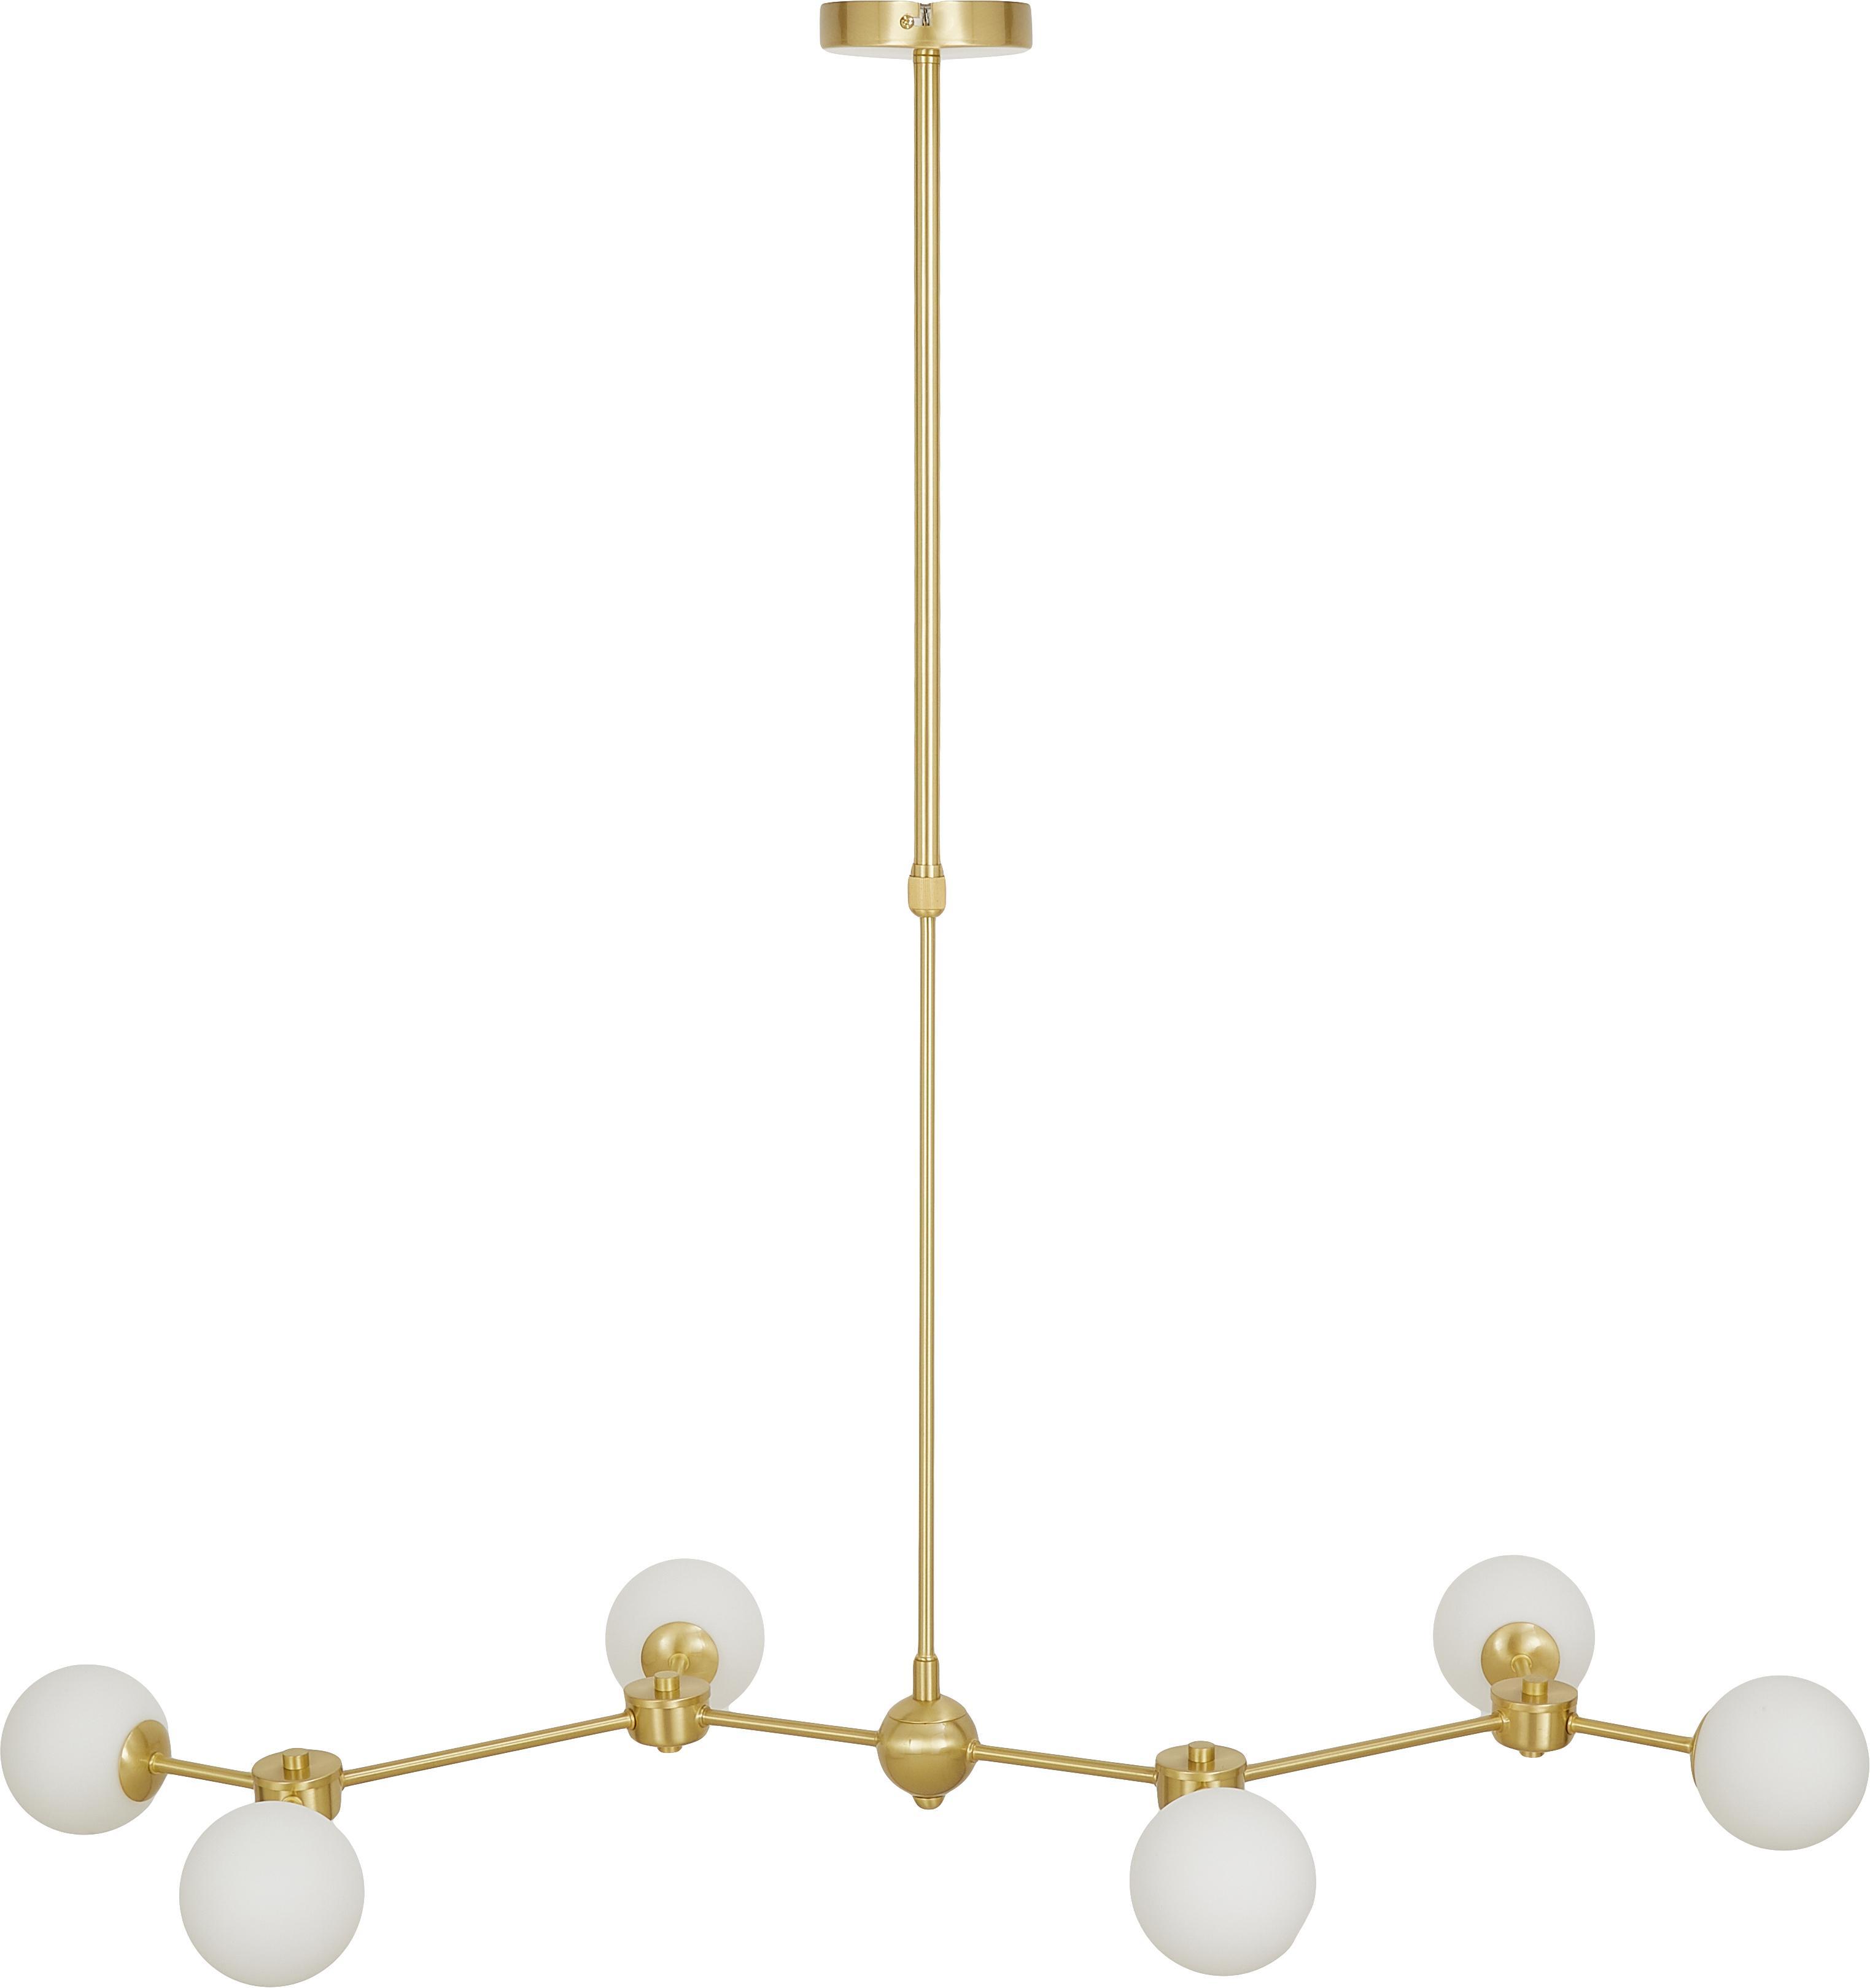 Grande suspension en métal doré Aurelia, Blanc, laiton